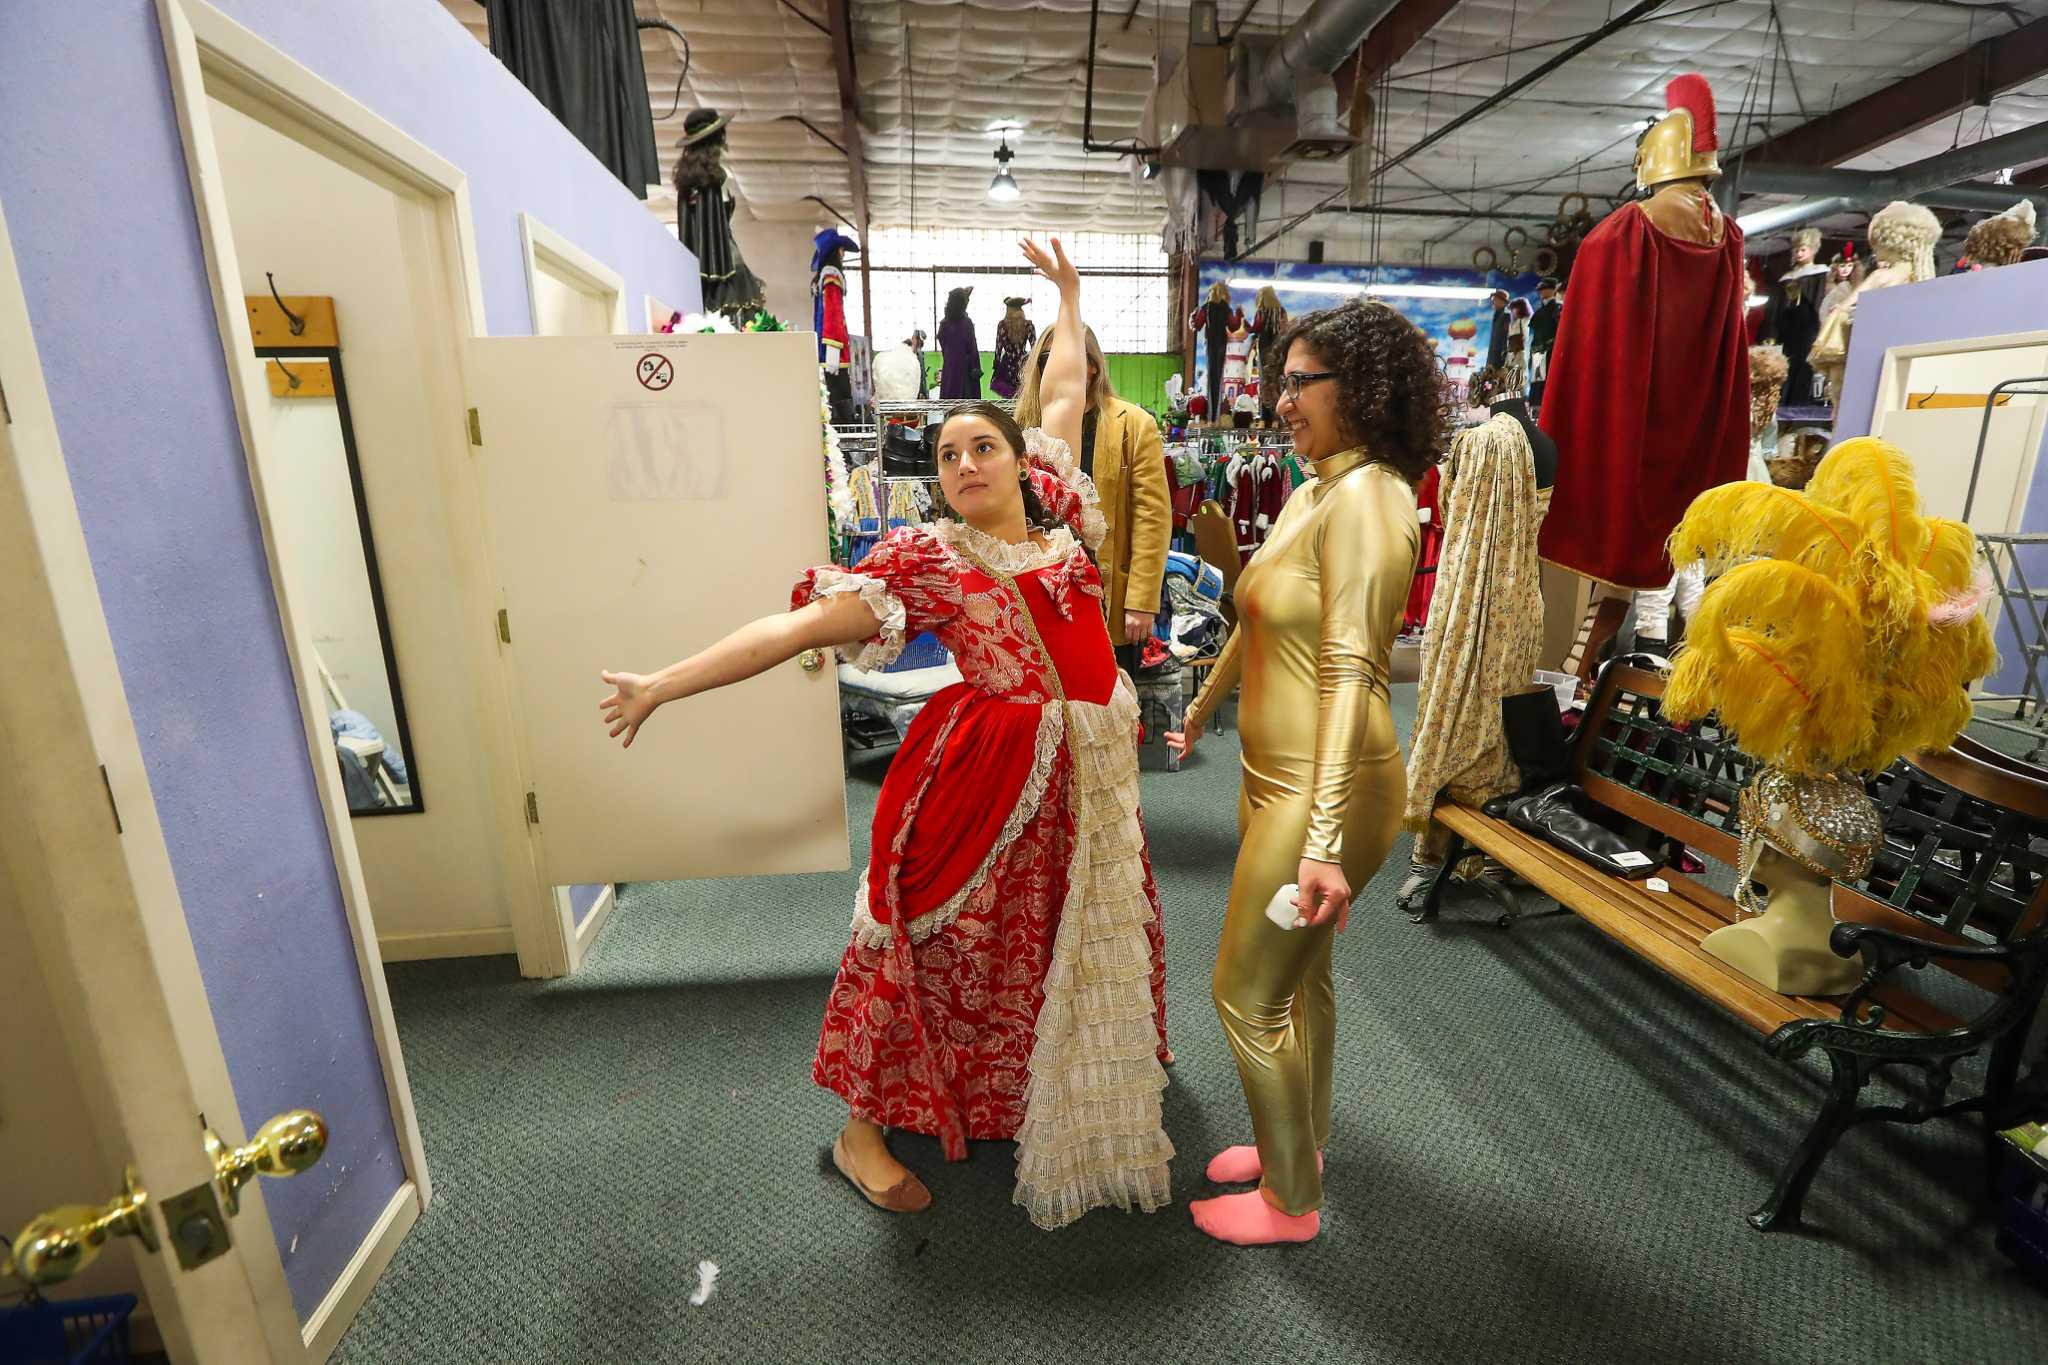 frankel's costume shop planning last garage sale - houston chronicle